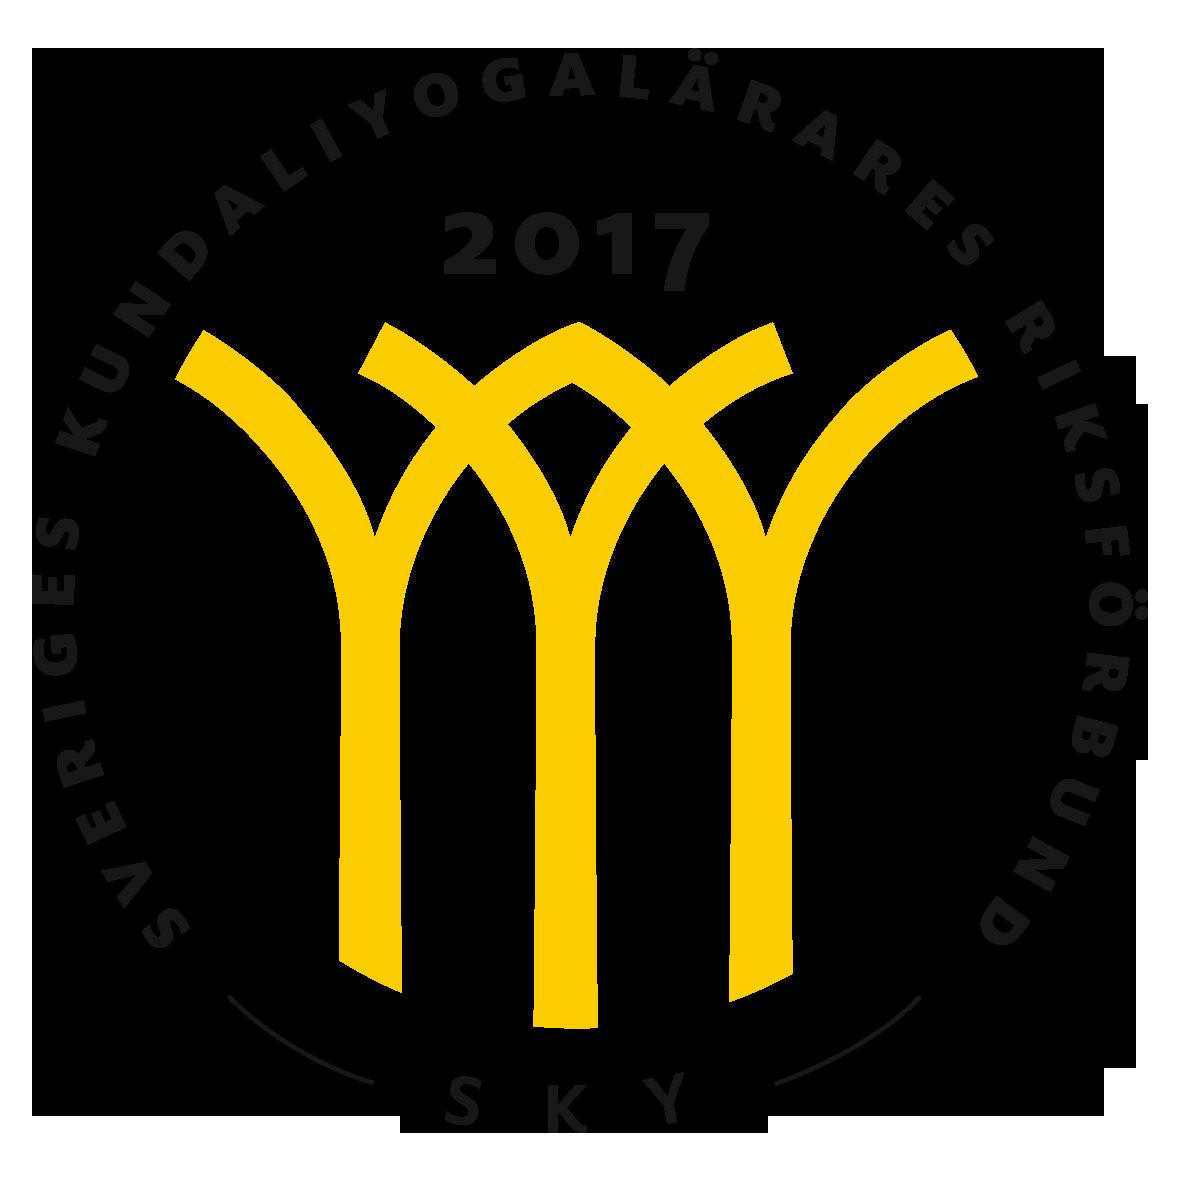 Sveriges Kundaliniyogalärares Riksförbund SKY Kvalitetssymbol 2017